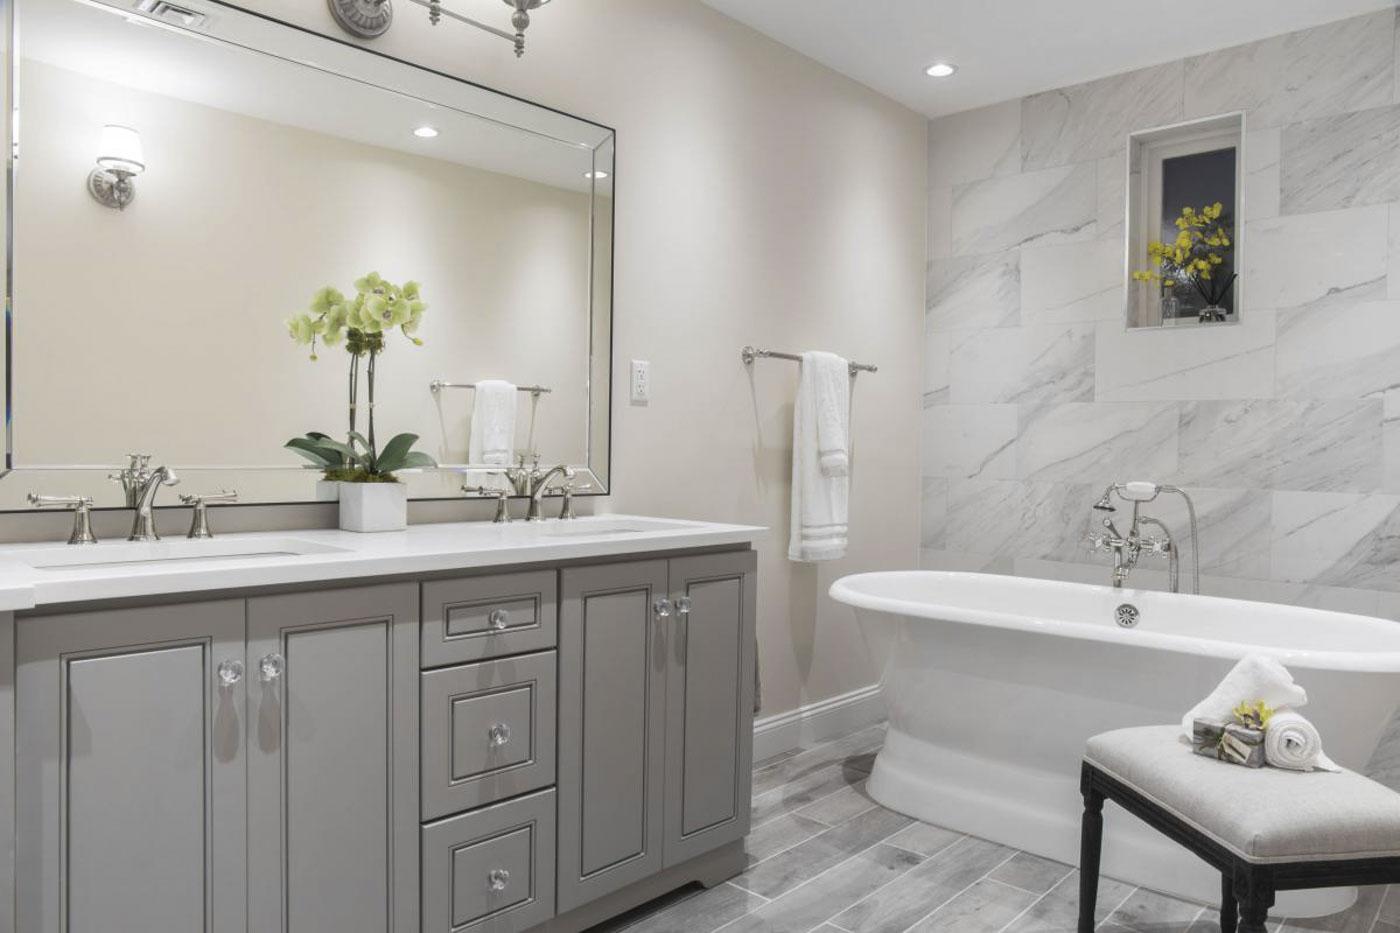 Kingston Grey – Kitchen Cabinets